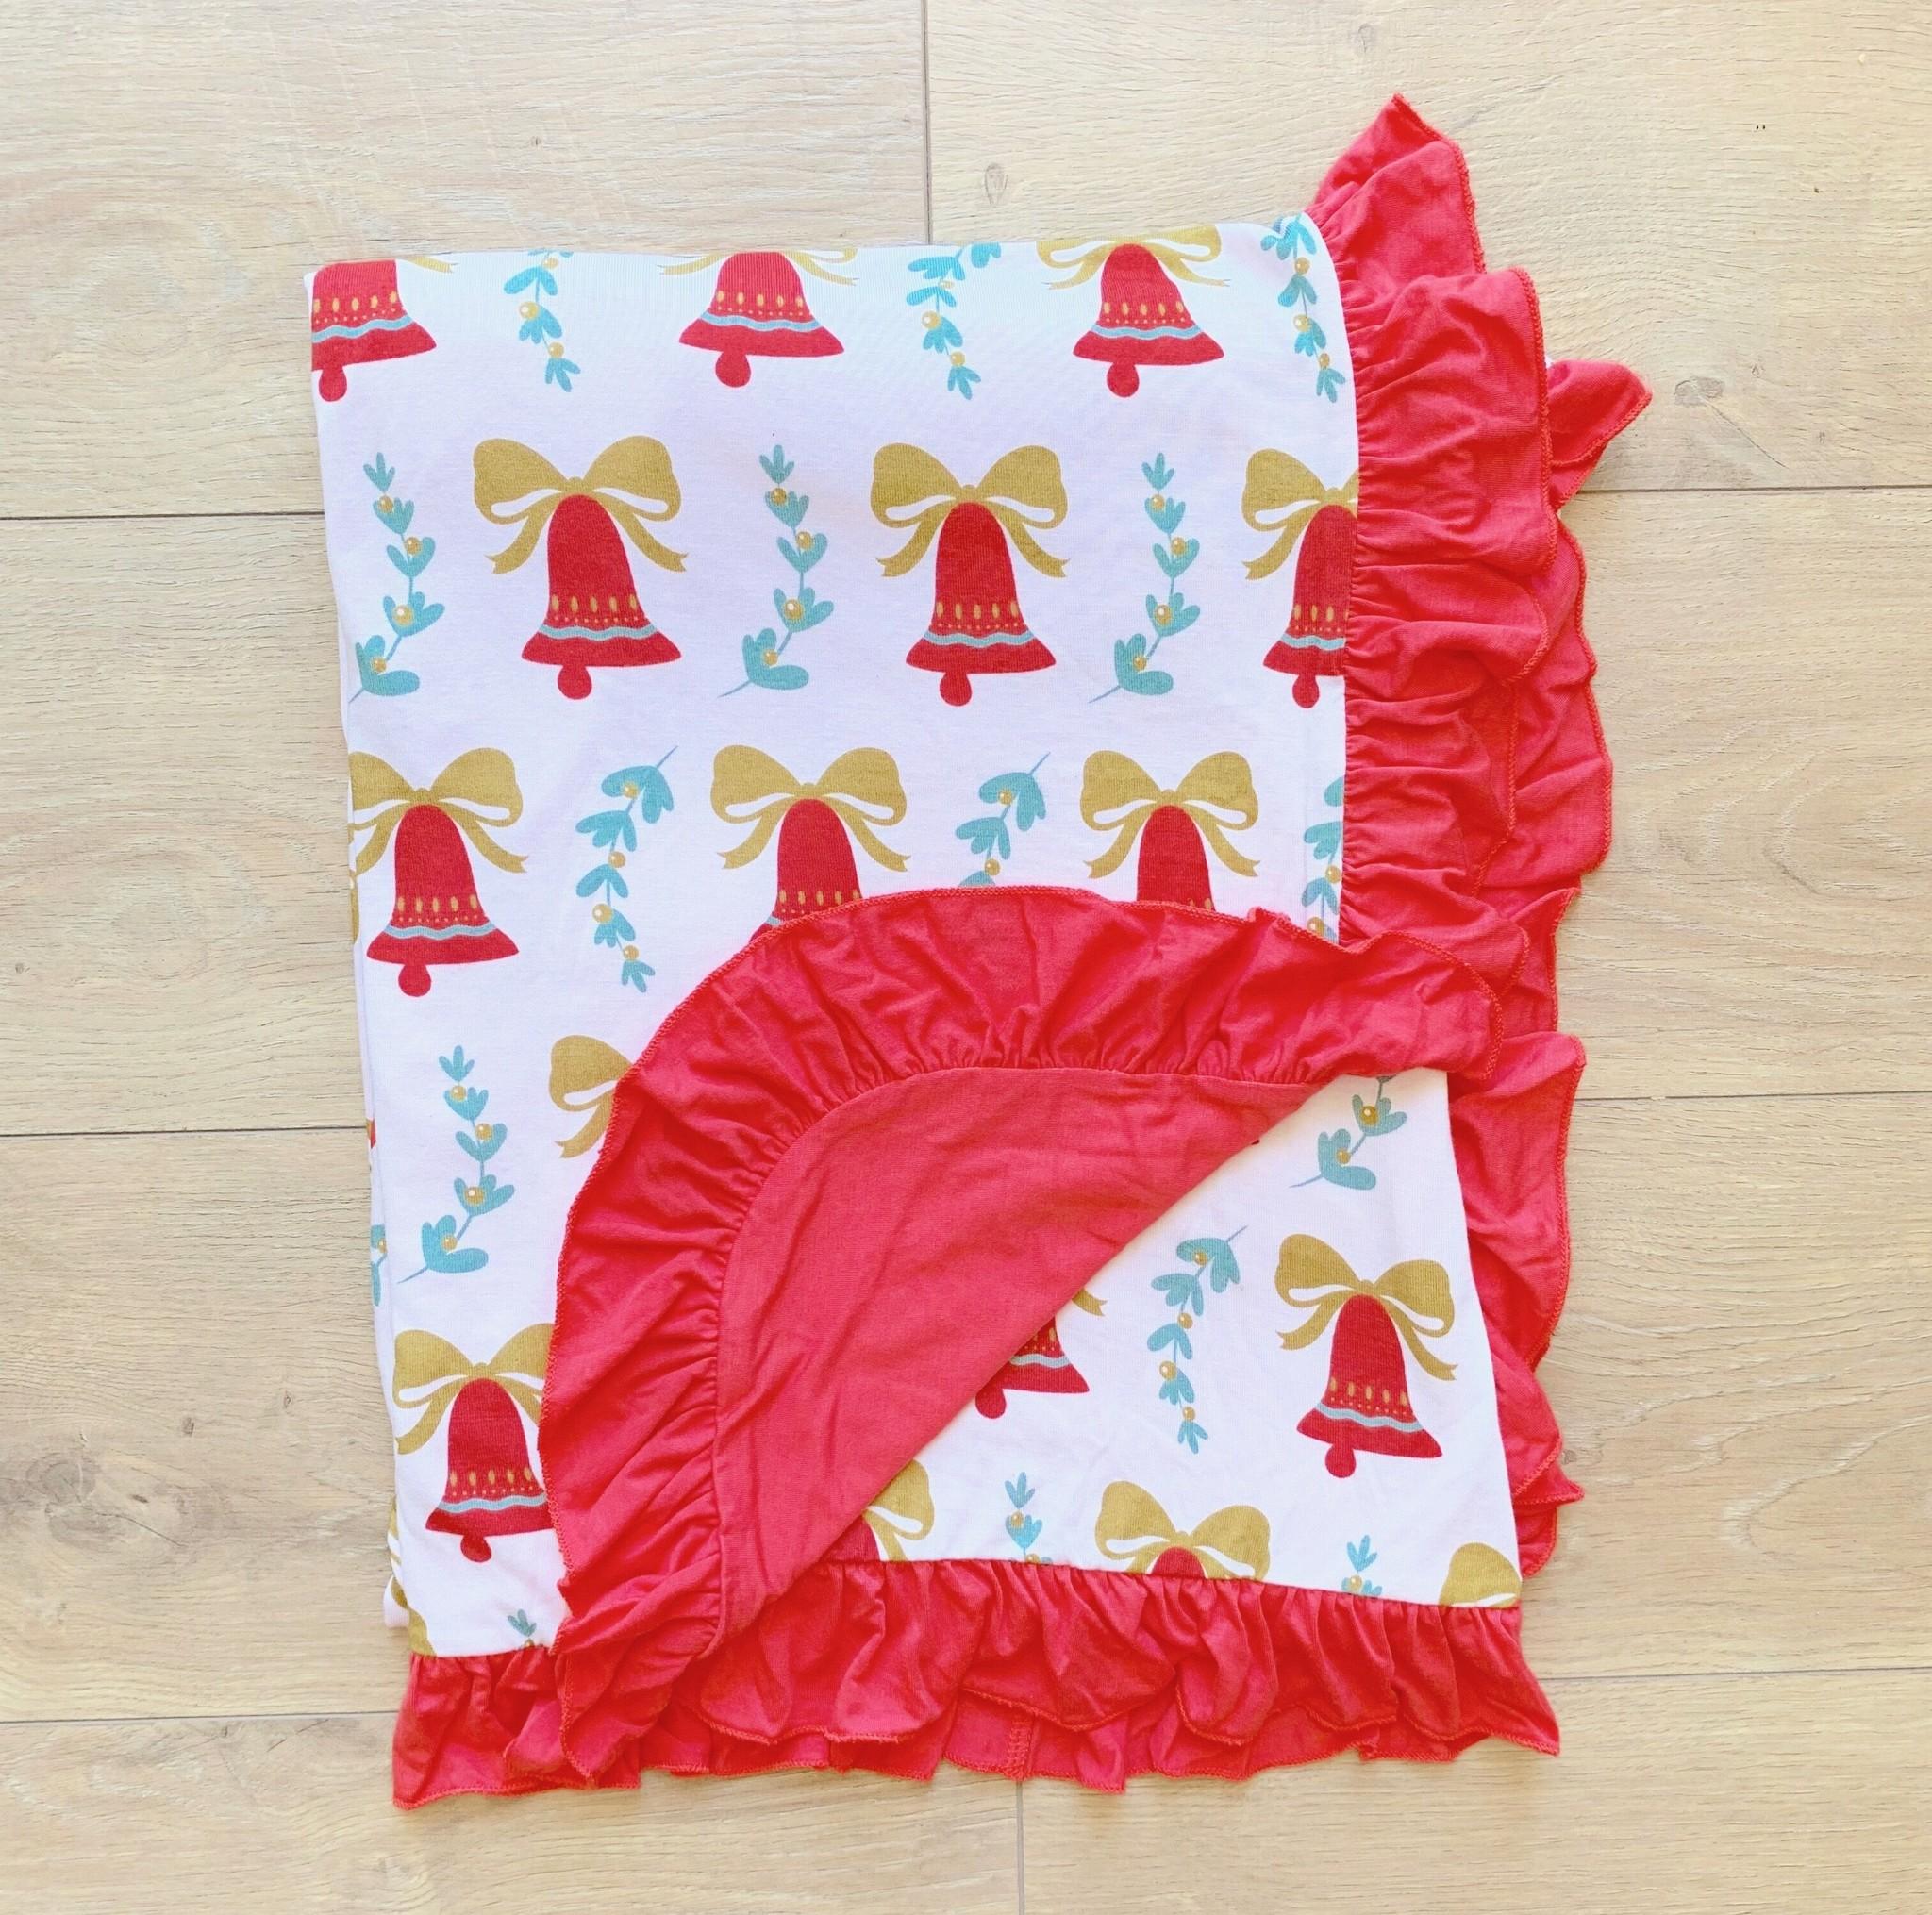 Kozi & Co Bells & Mistletoe Ruffle Blanket (34 x 44 inches)